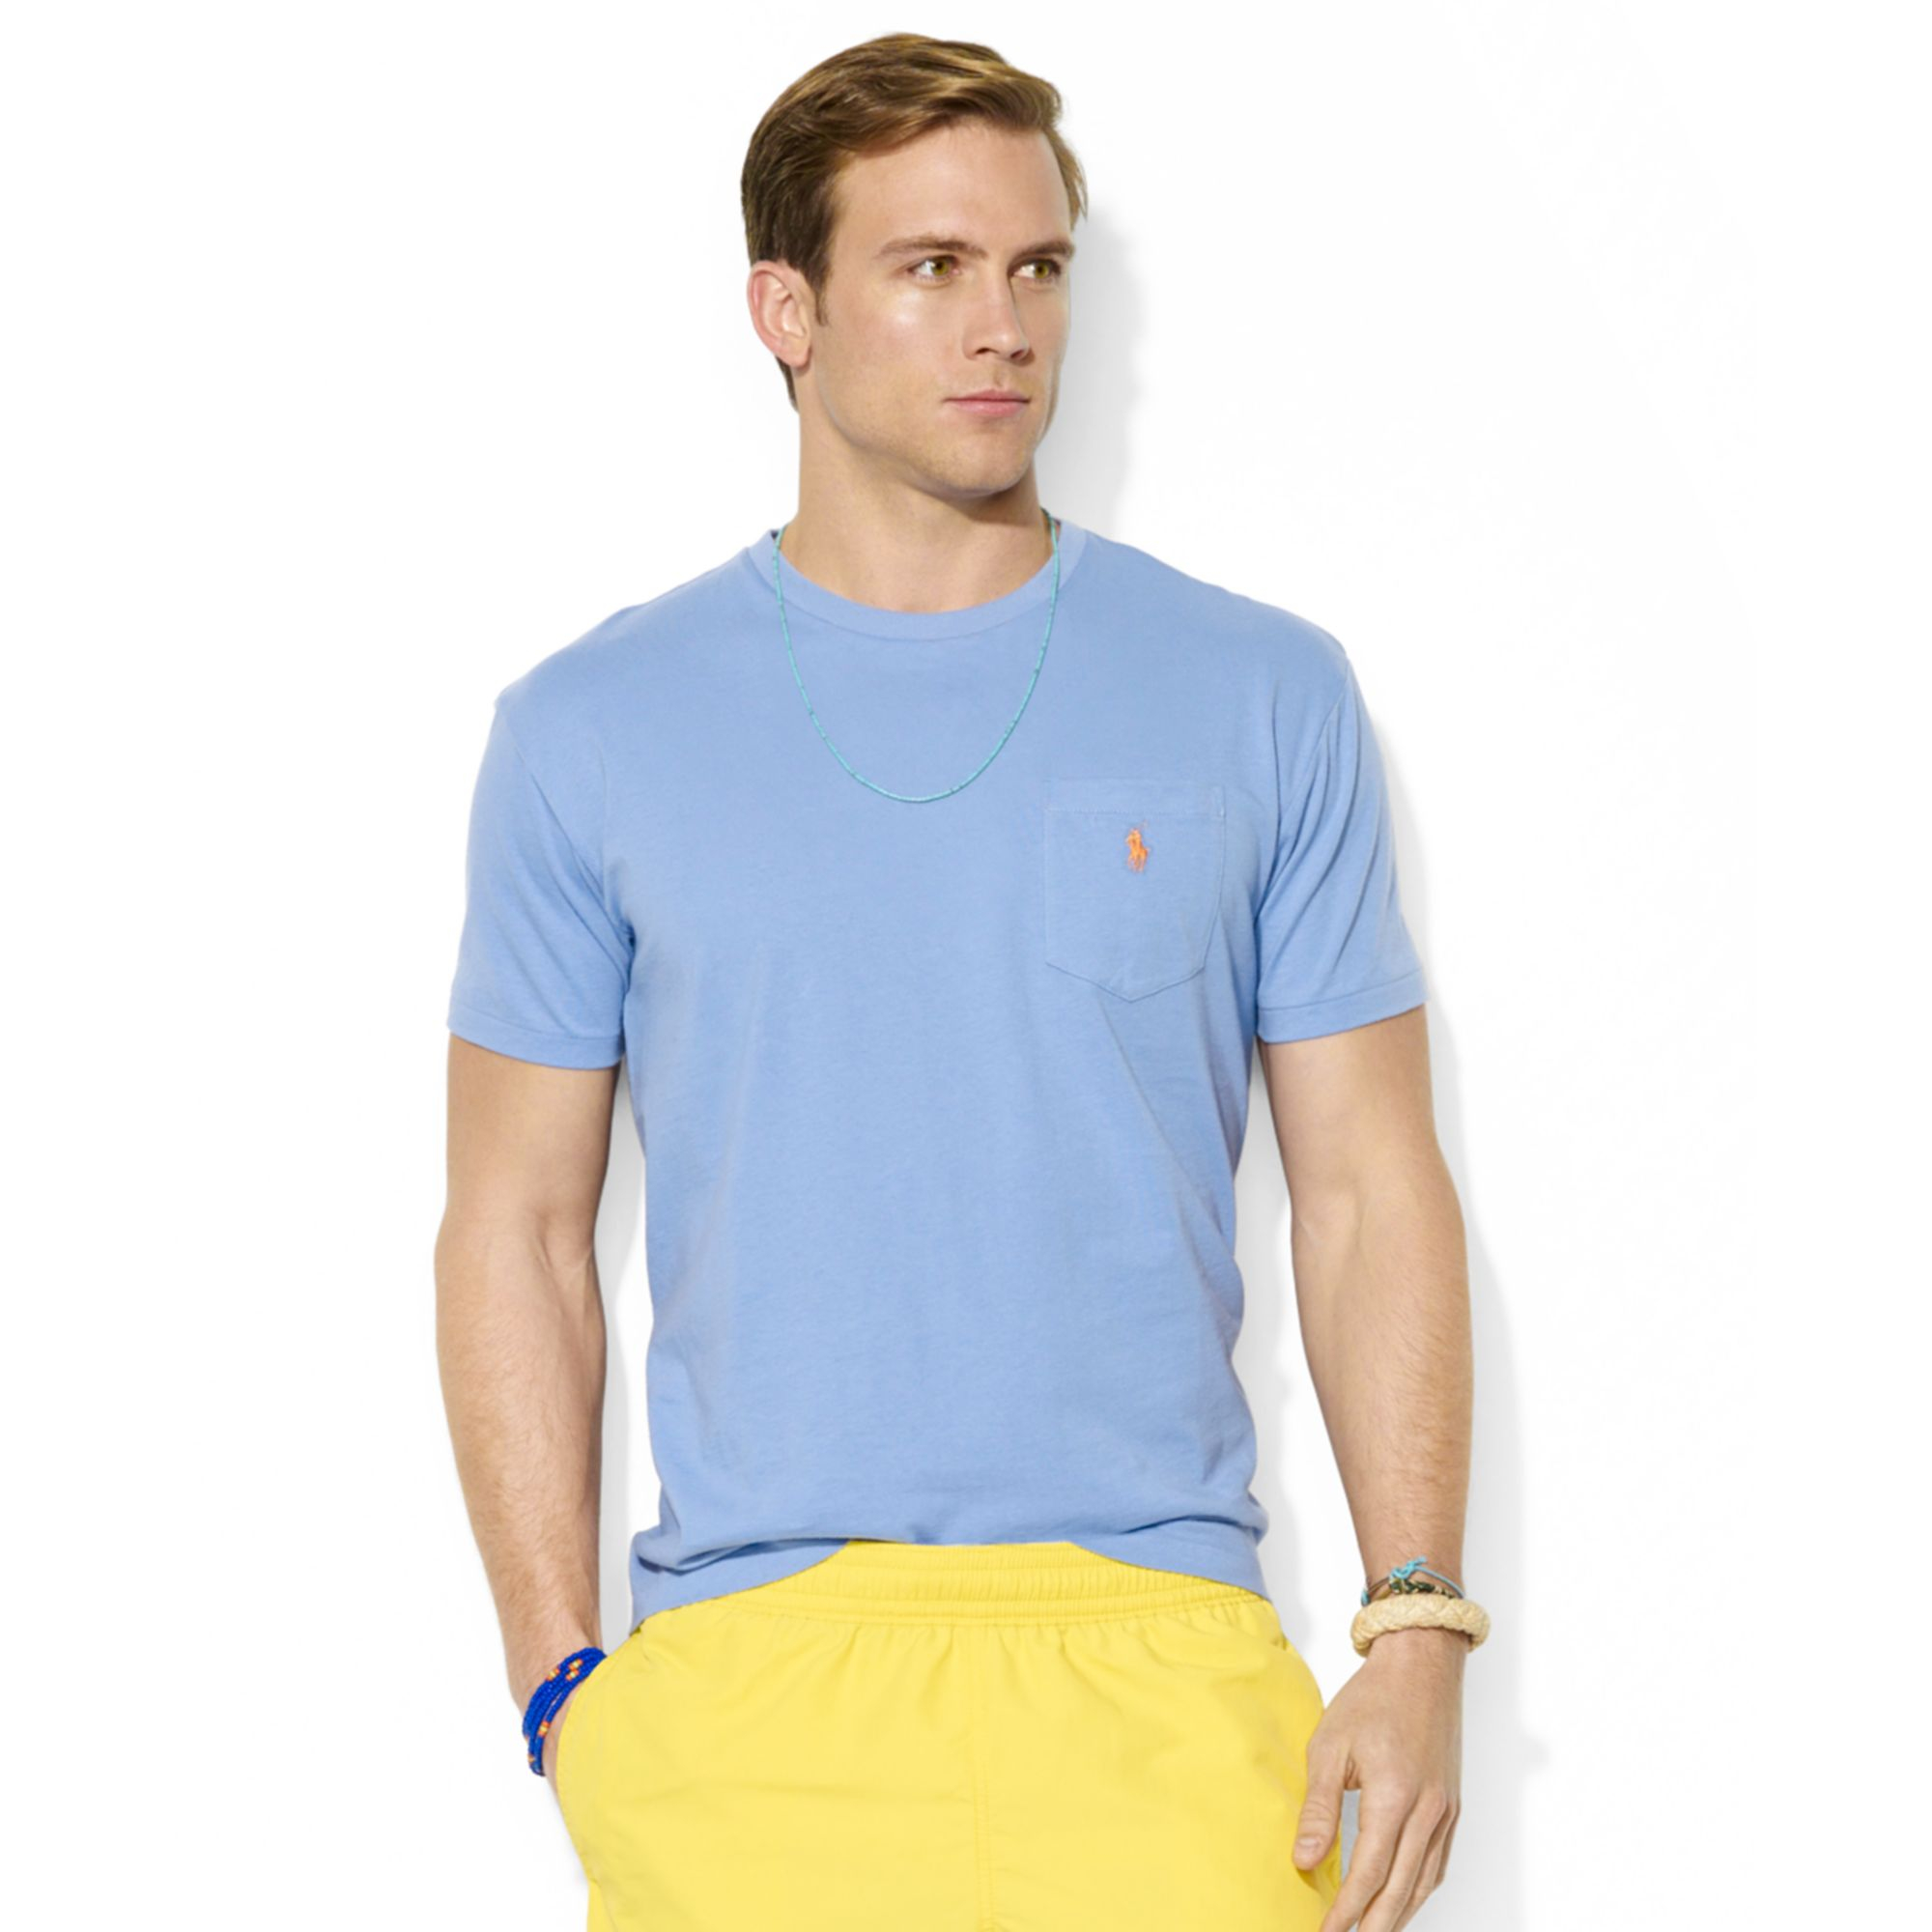 Lyst - Polo Ralph Lauren Polo Classicfit Cotton Jersey Pocket Tshirt ... 84a97f0e5b20